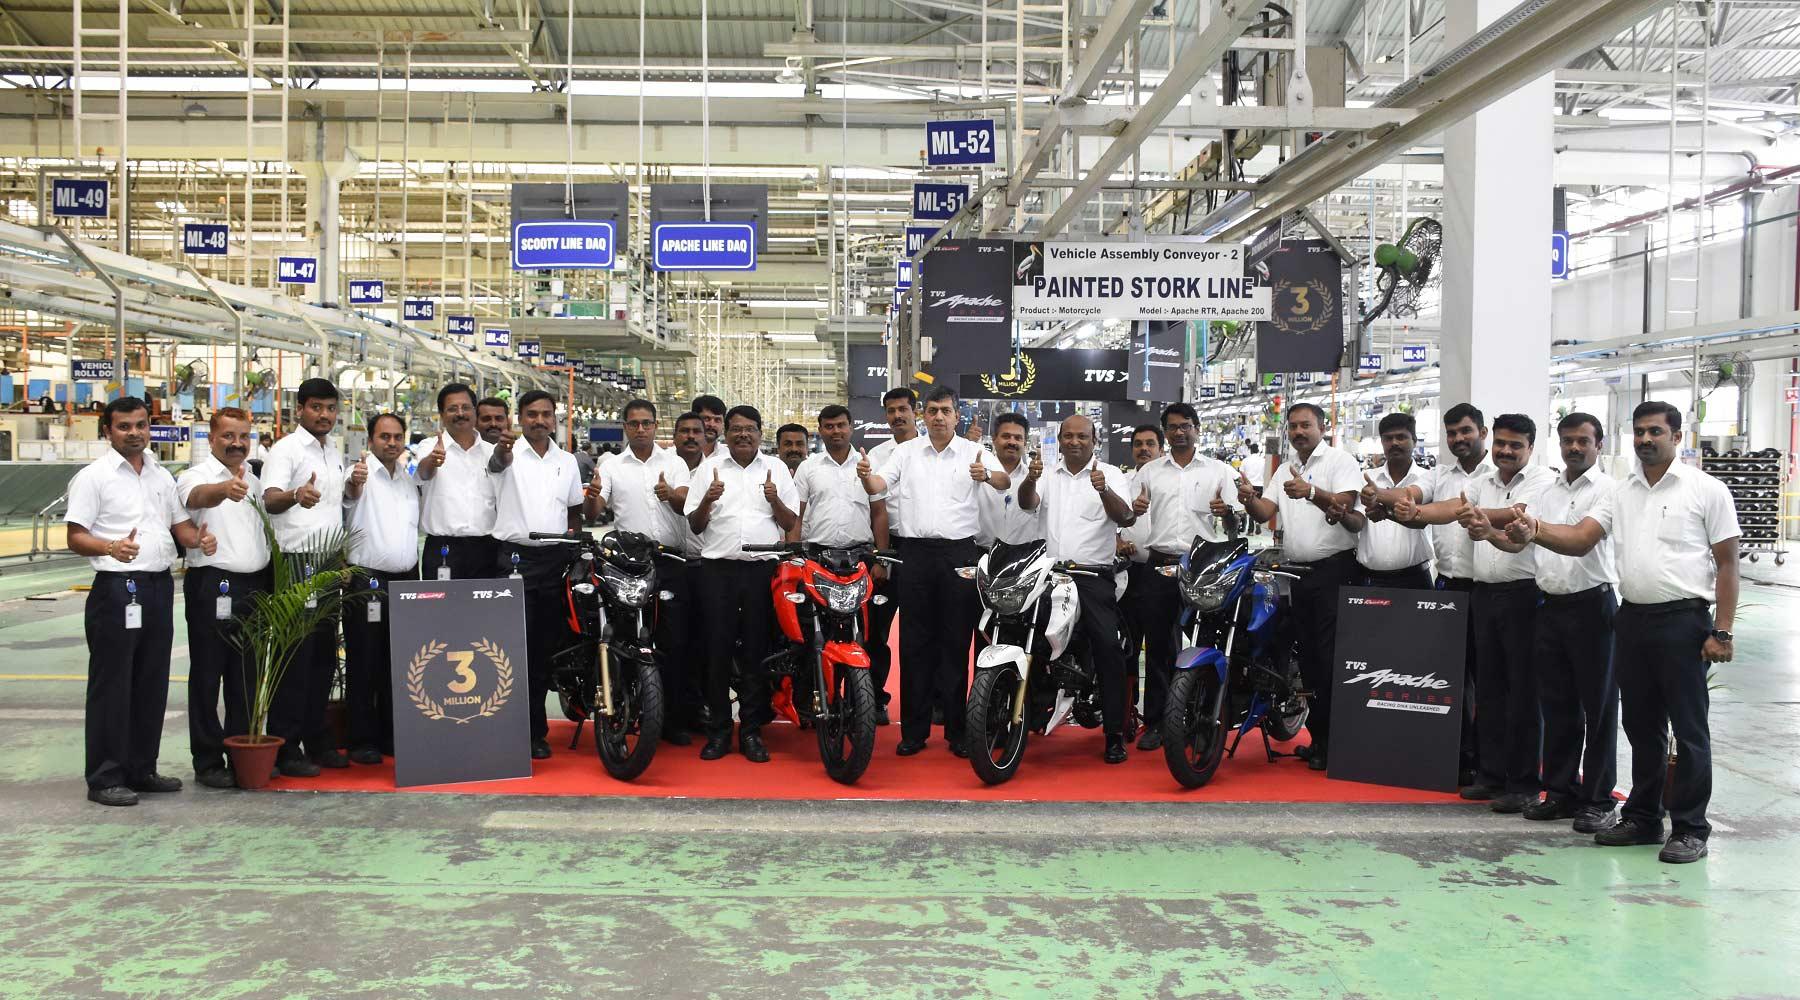 TVS Apache Series crosses 3 million sales milestone KN Radhakrishnan and team Mysore